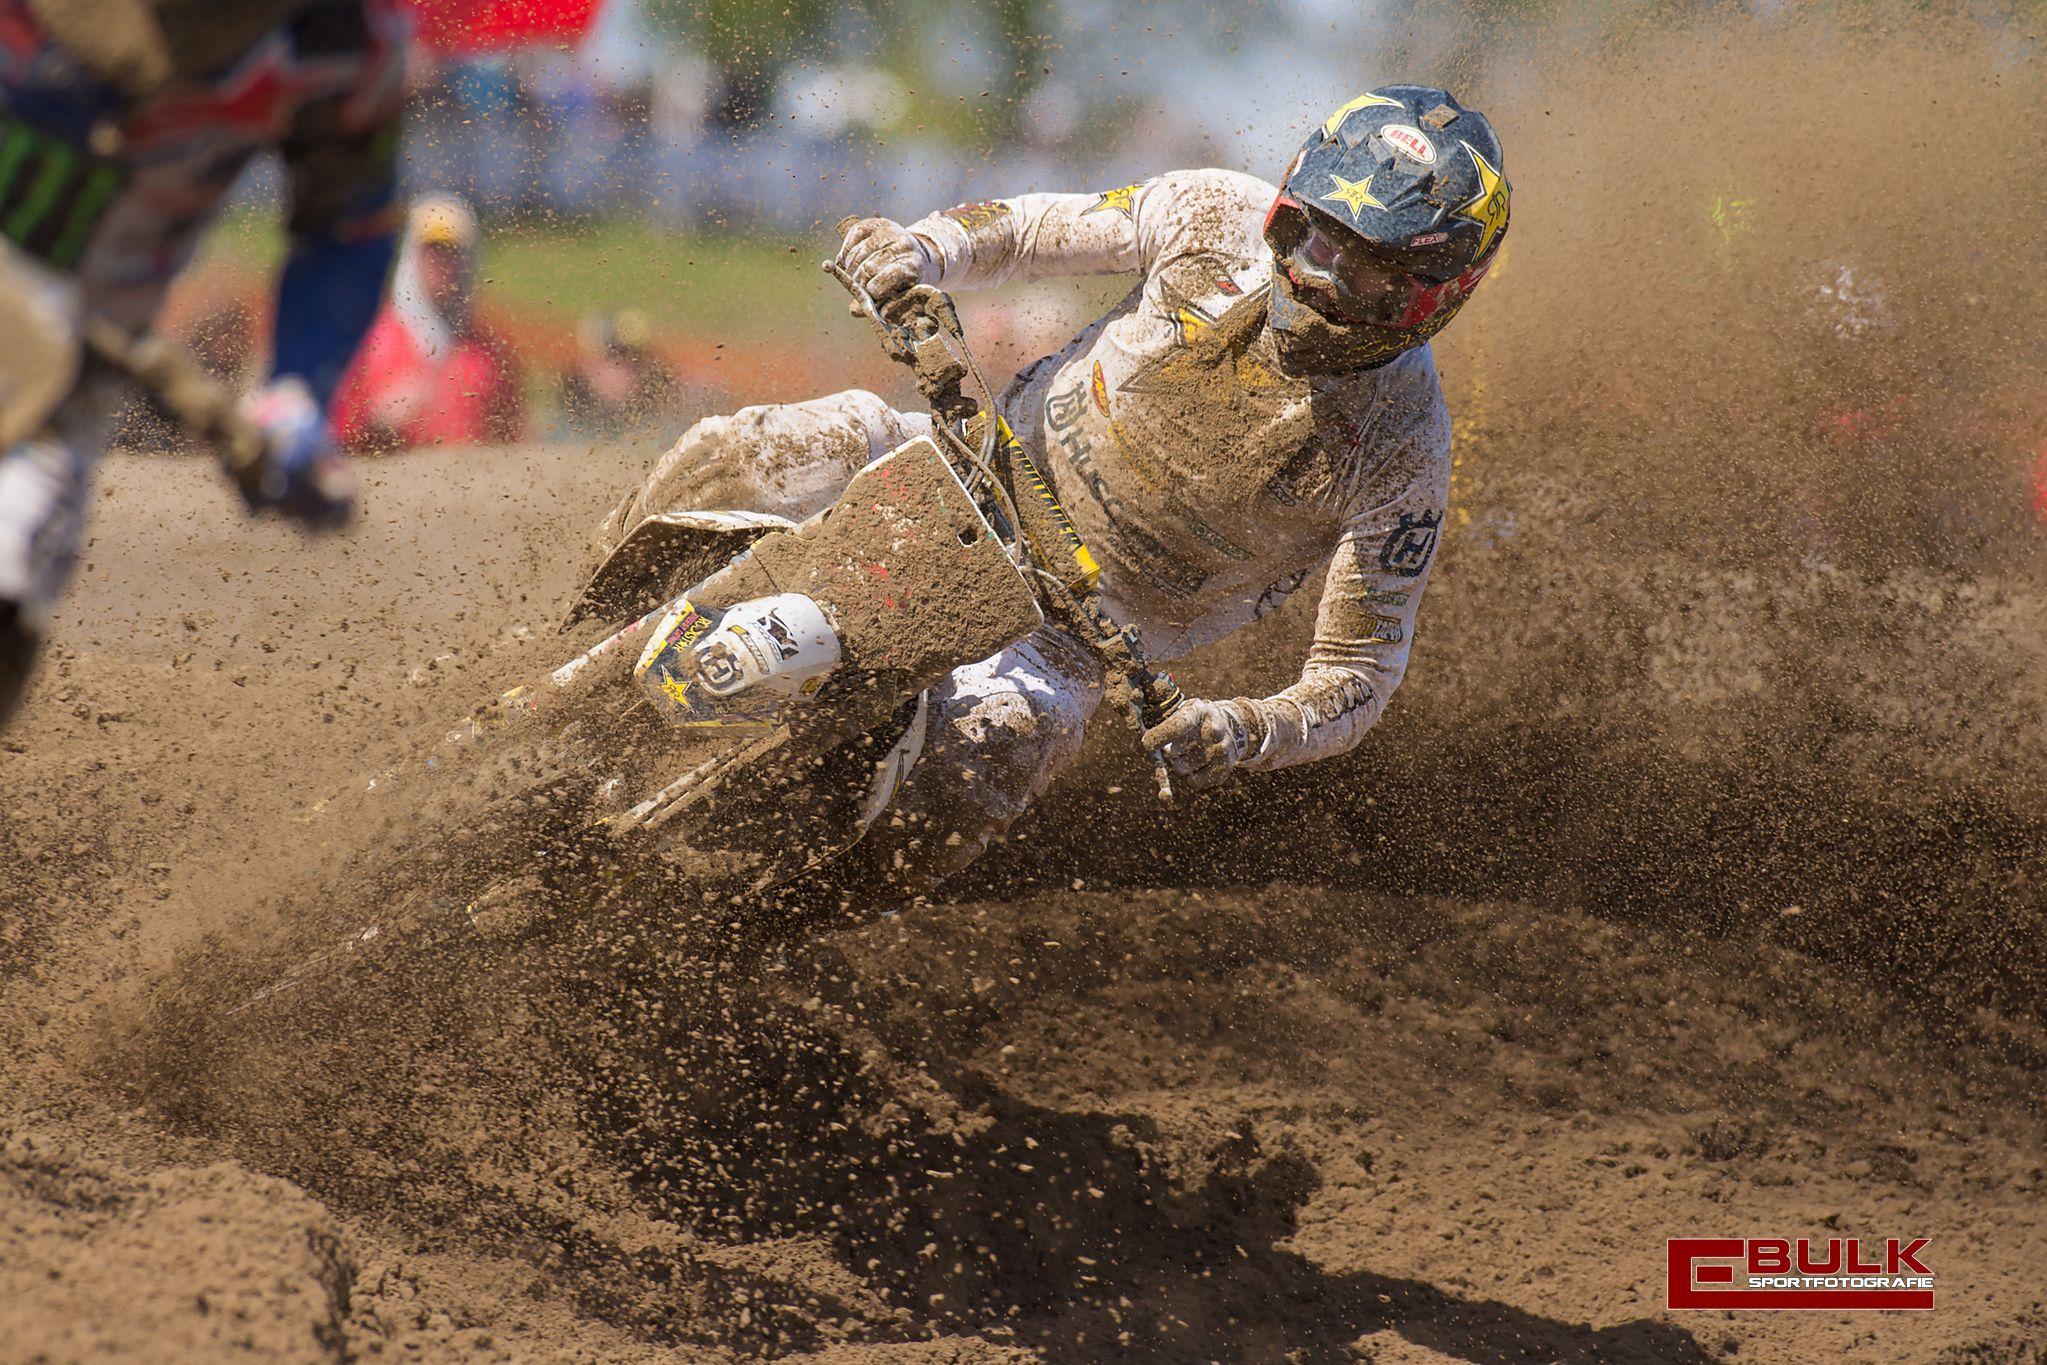 ebs_0657-ed_bulk_sportfotografie